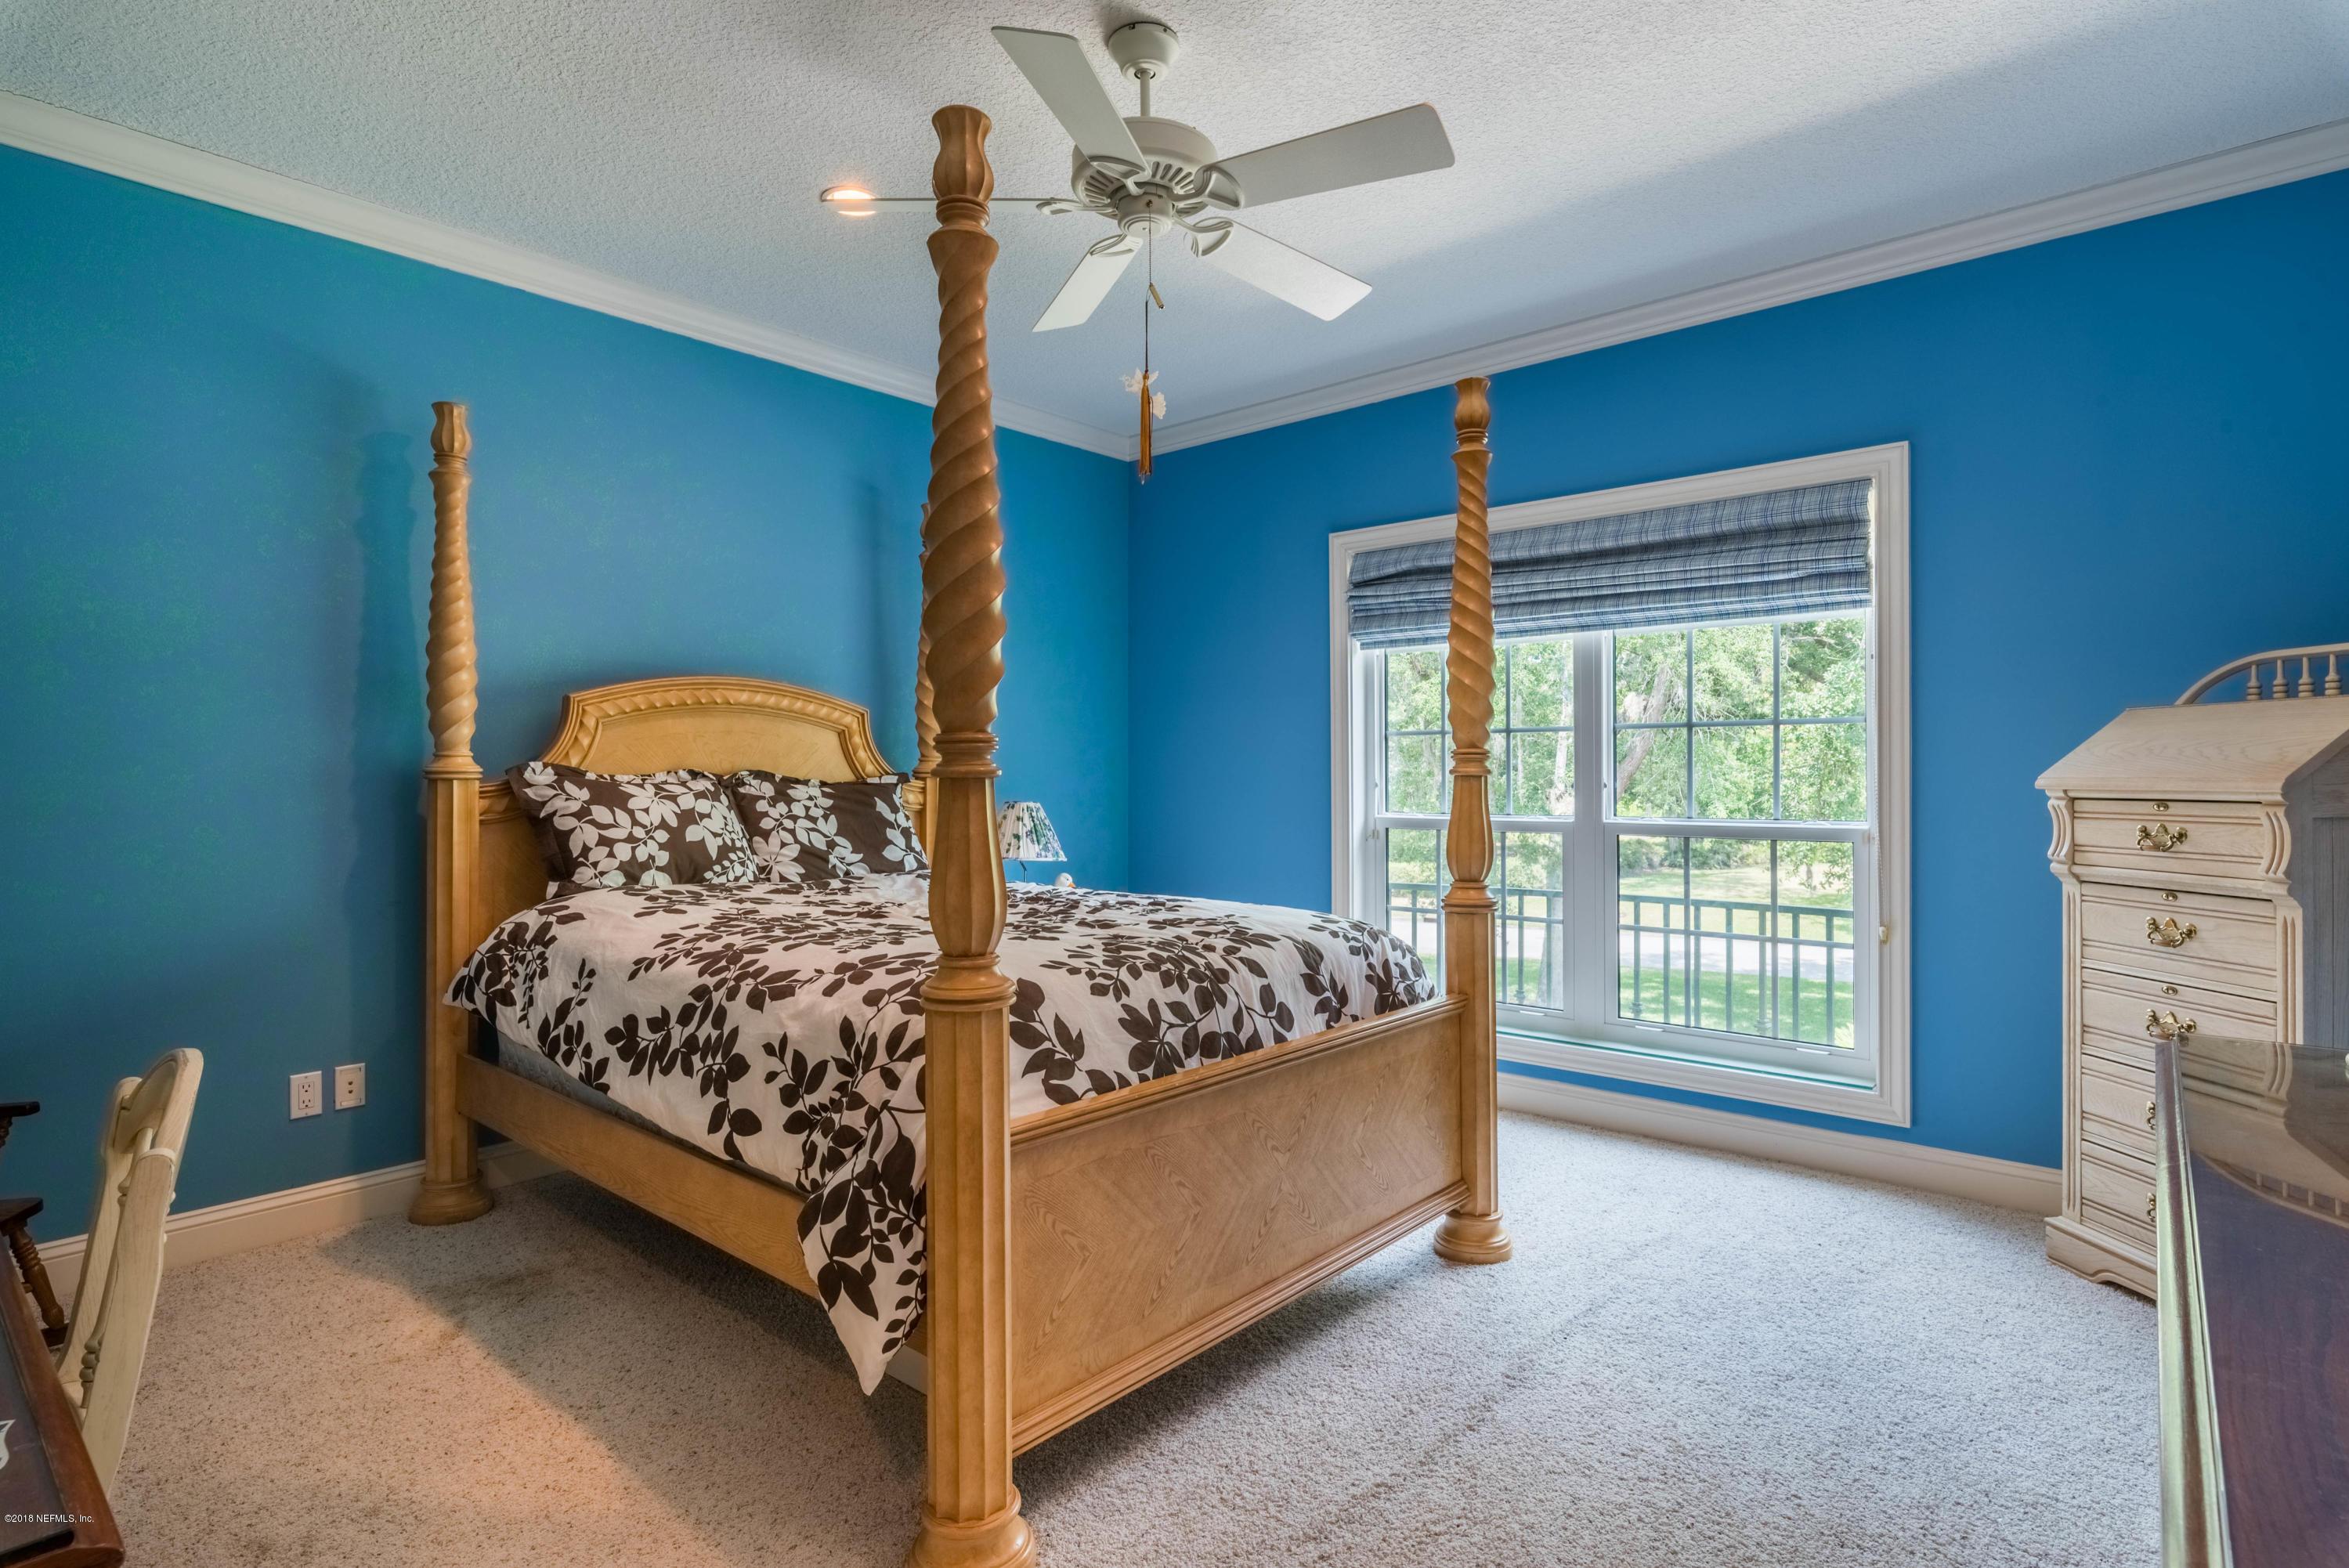 7852 JAMES ISLAND, JACKSONVILLE, FLORIDA 32256, 5 Bedrooms Bedrooms, ,6 BathroomsBathrooms,Residential - single family,For sale,JAMES ISLAND,934908